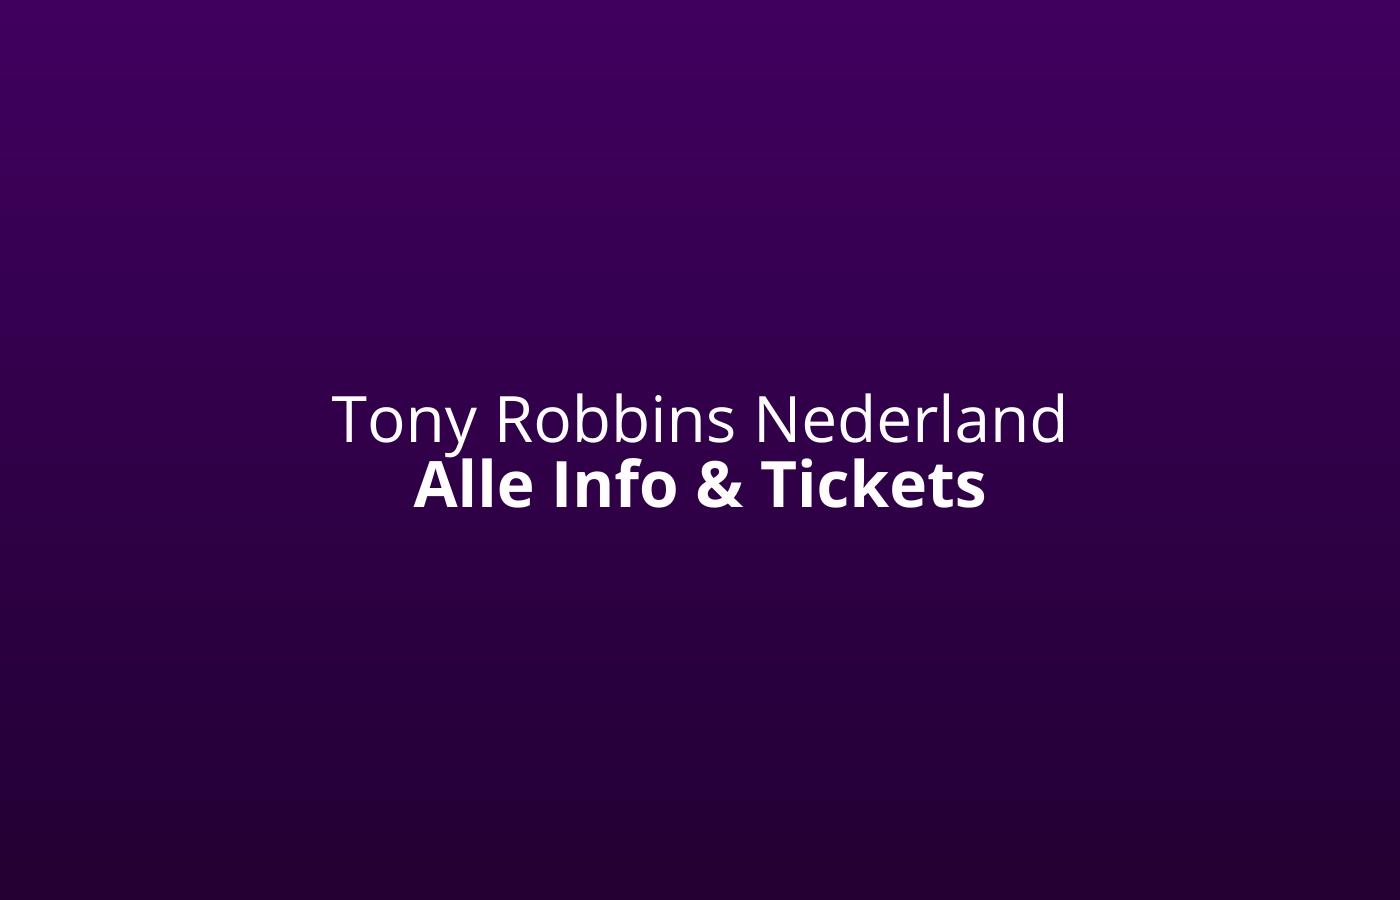 tony robbins nederland